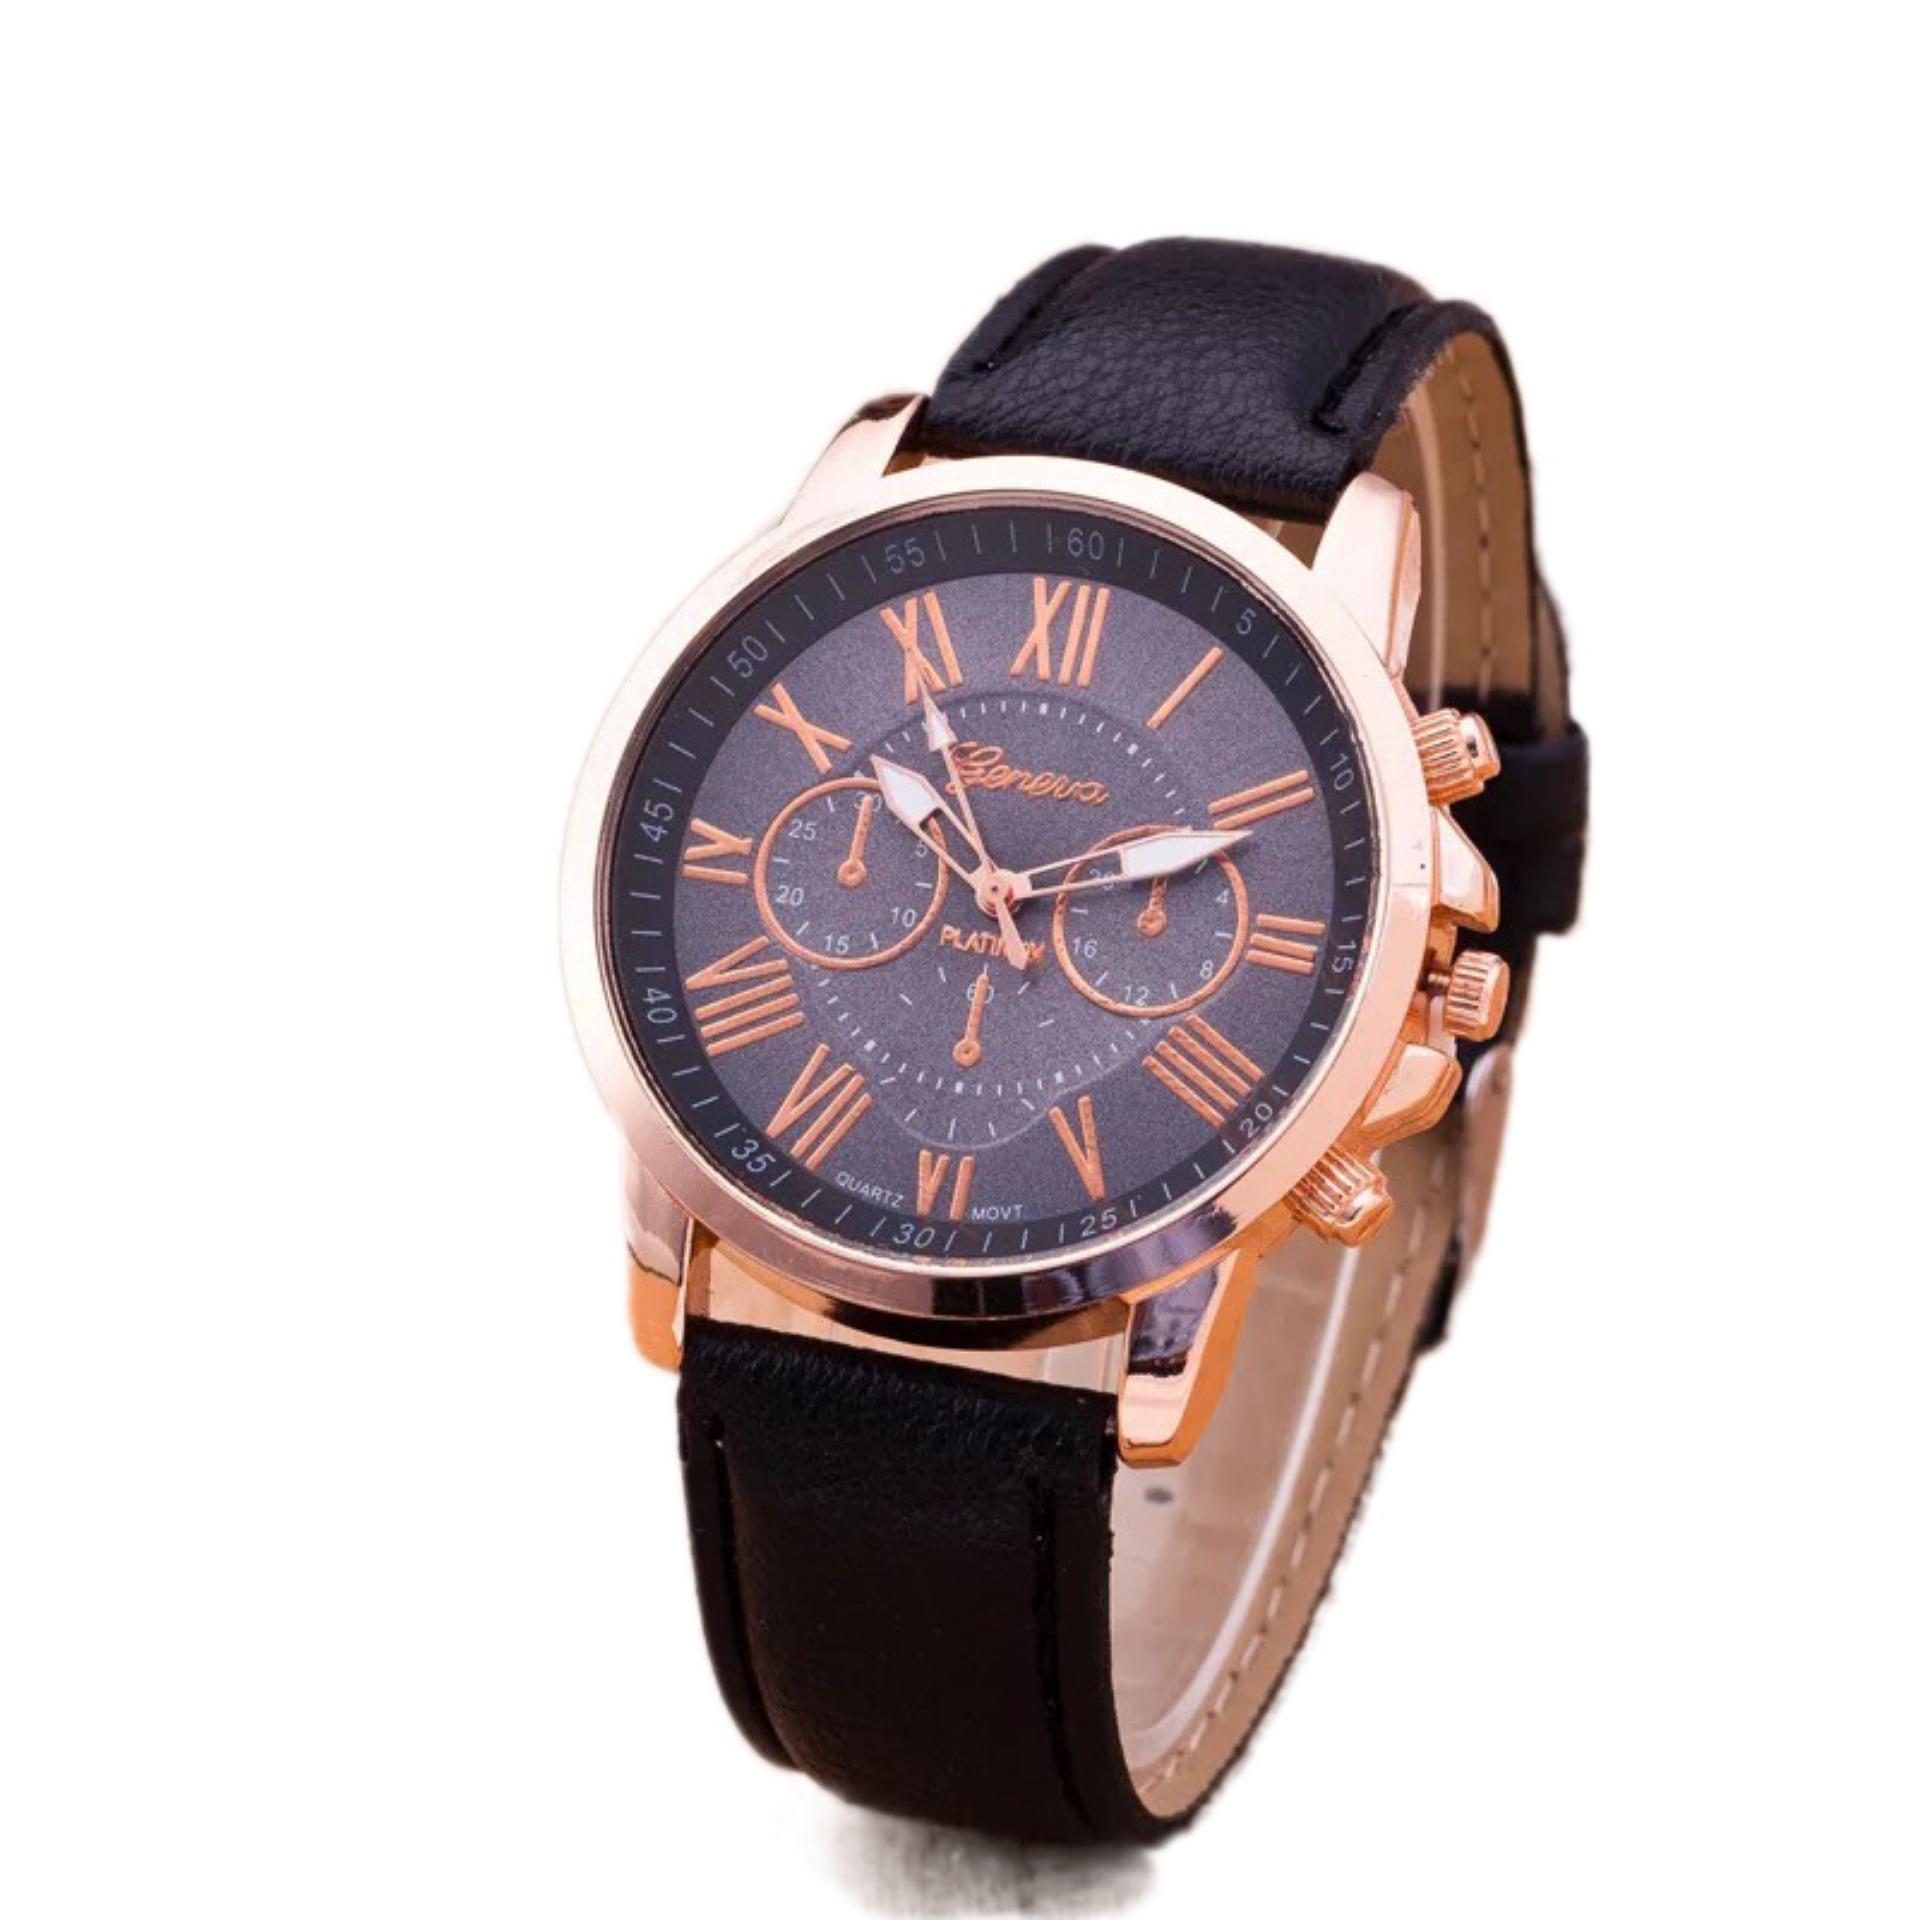 Đồng hồ nữ dây da Geneva cá tính (Đen)